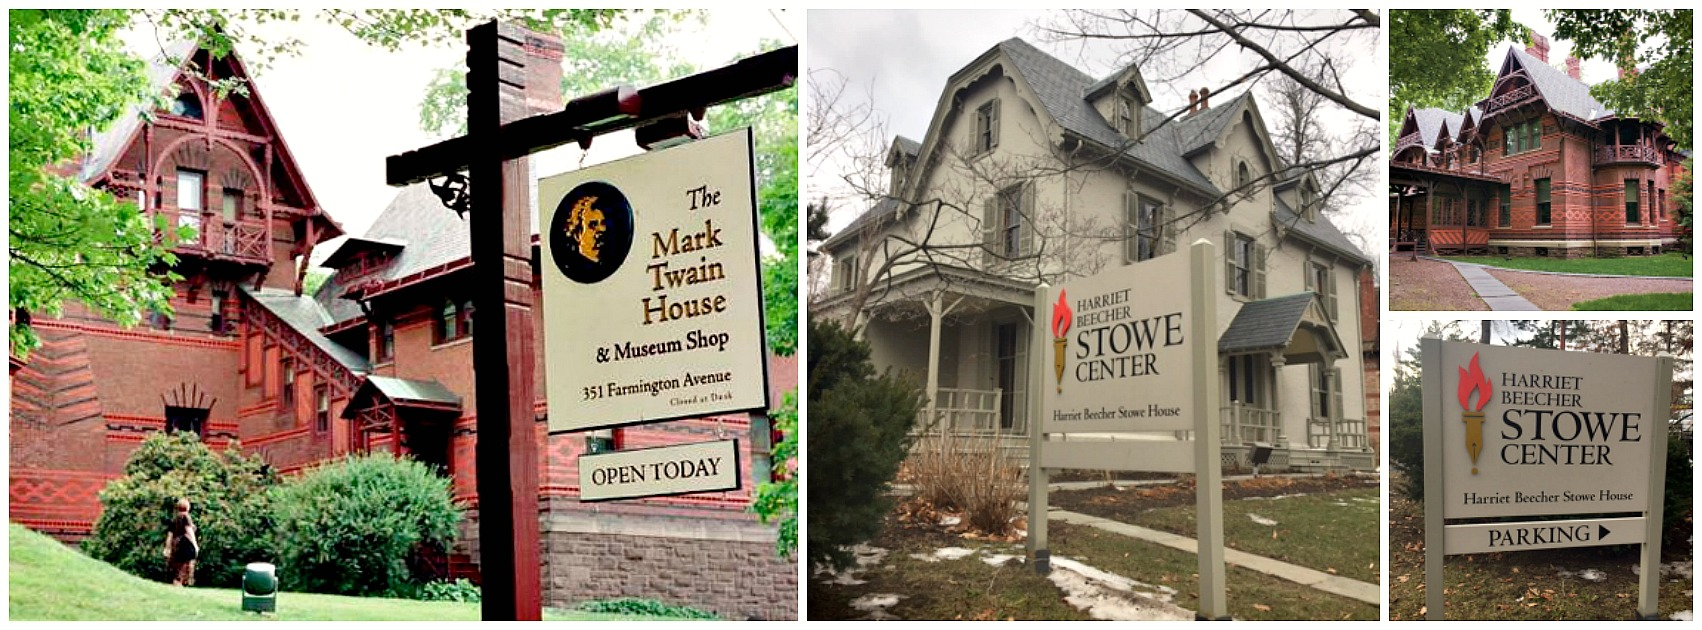 job story mark twain house harriet beecher stowe house